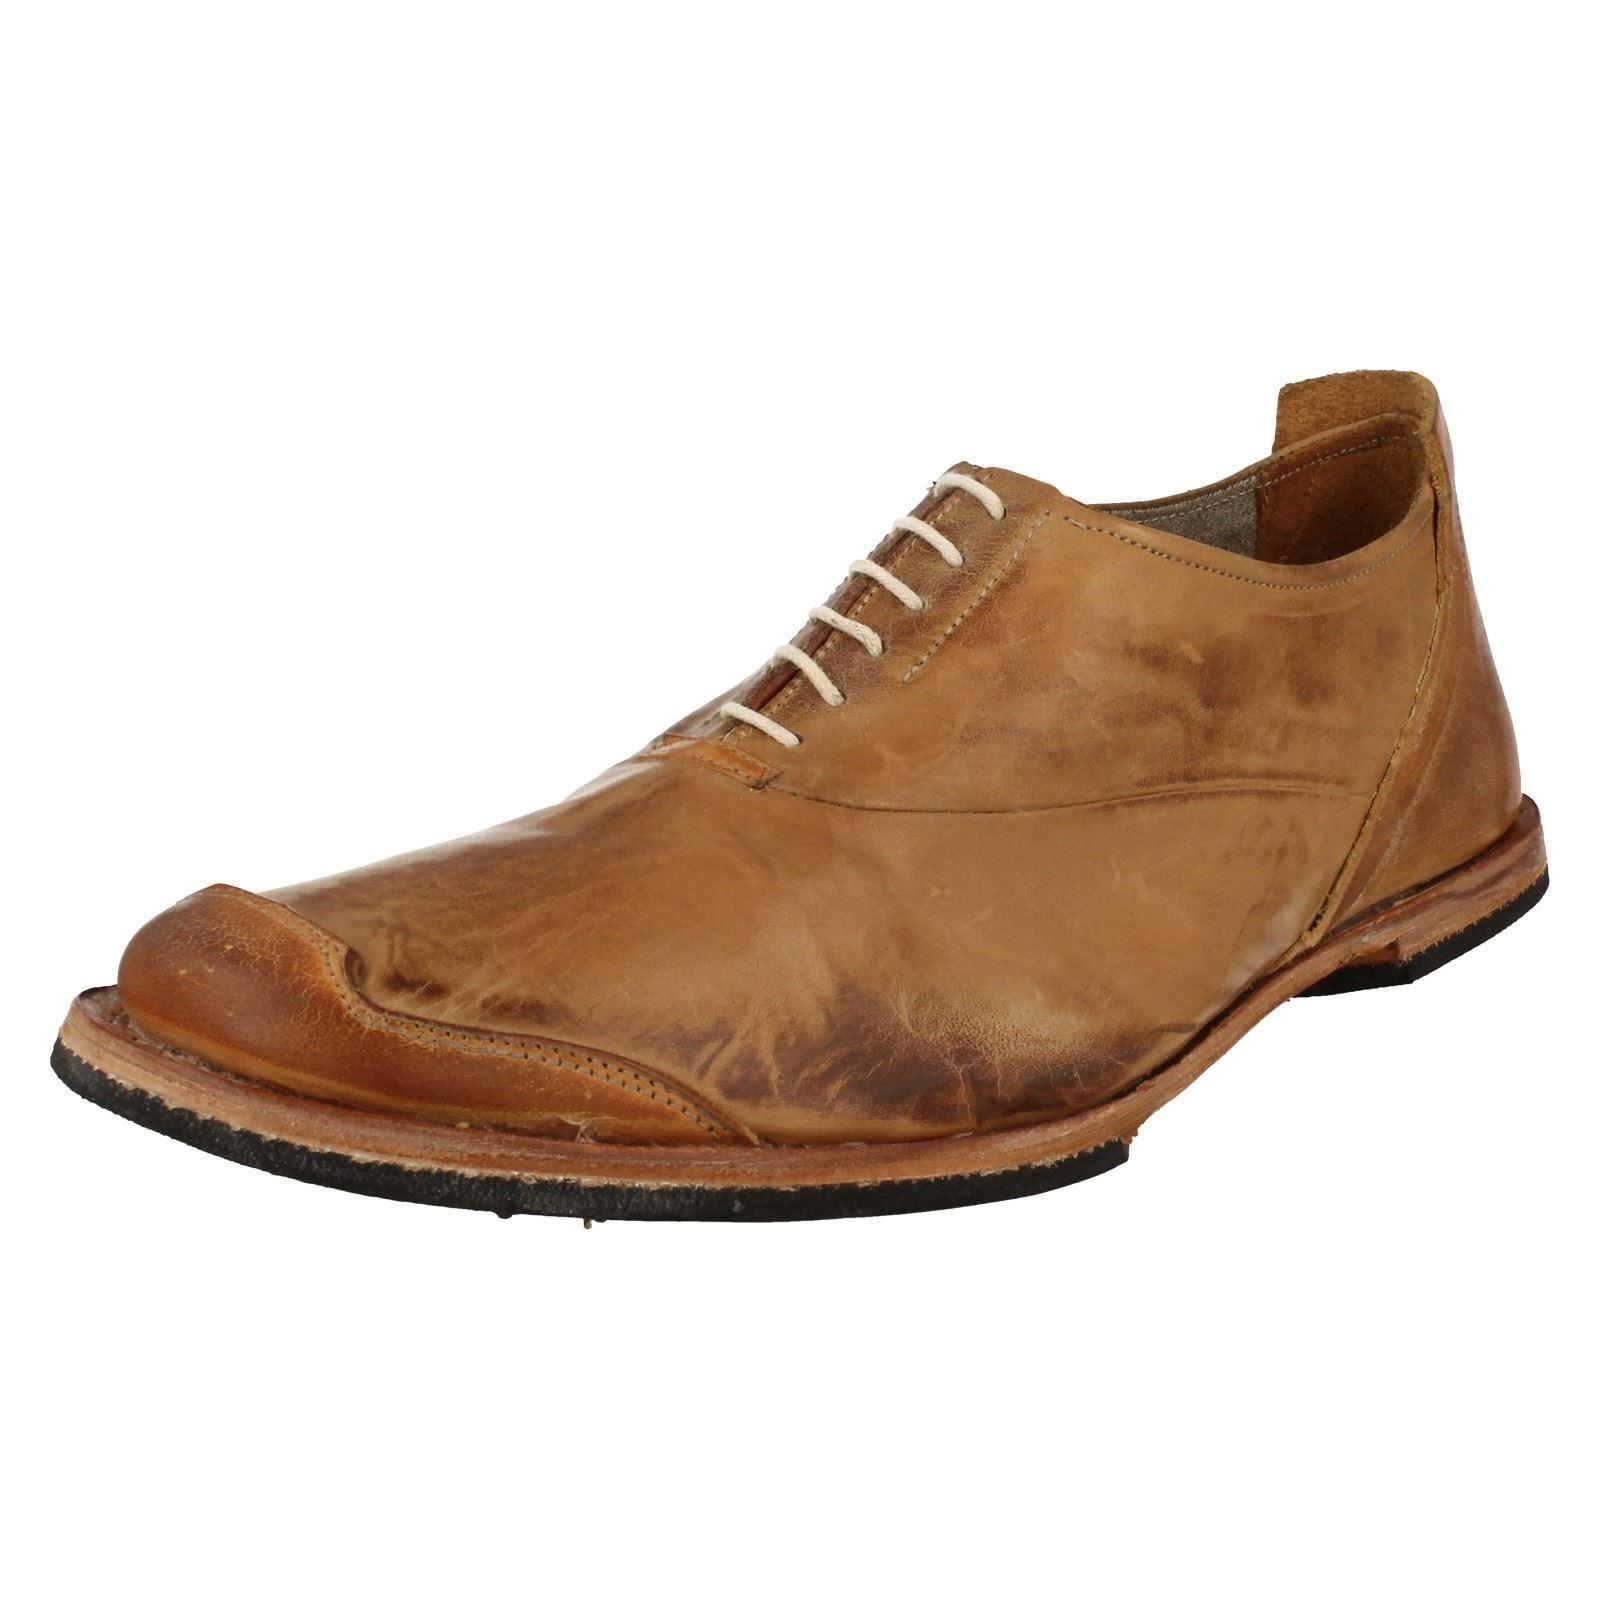 mens timberland wodehouse lace up shoes 82522 ebay